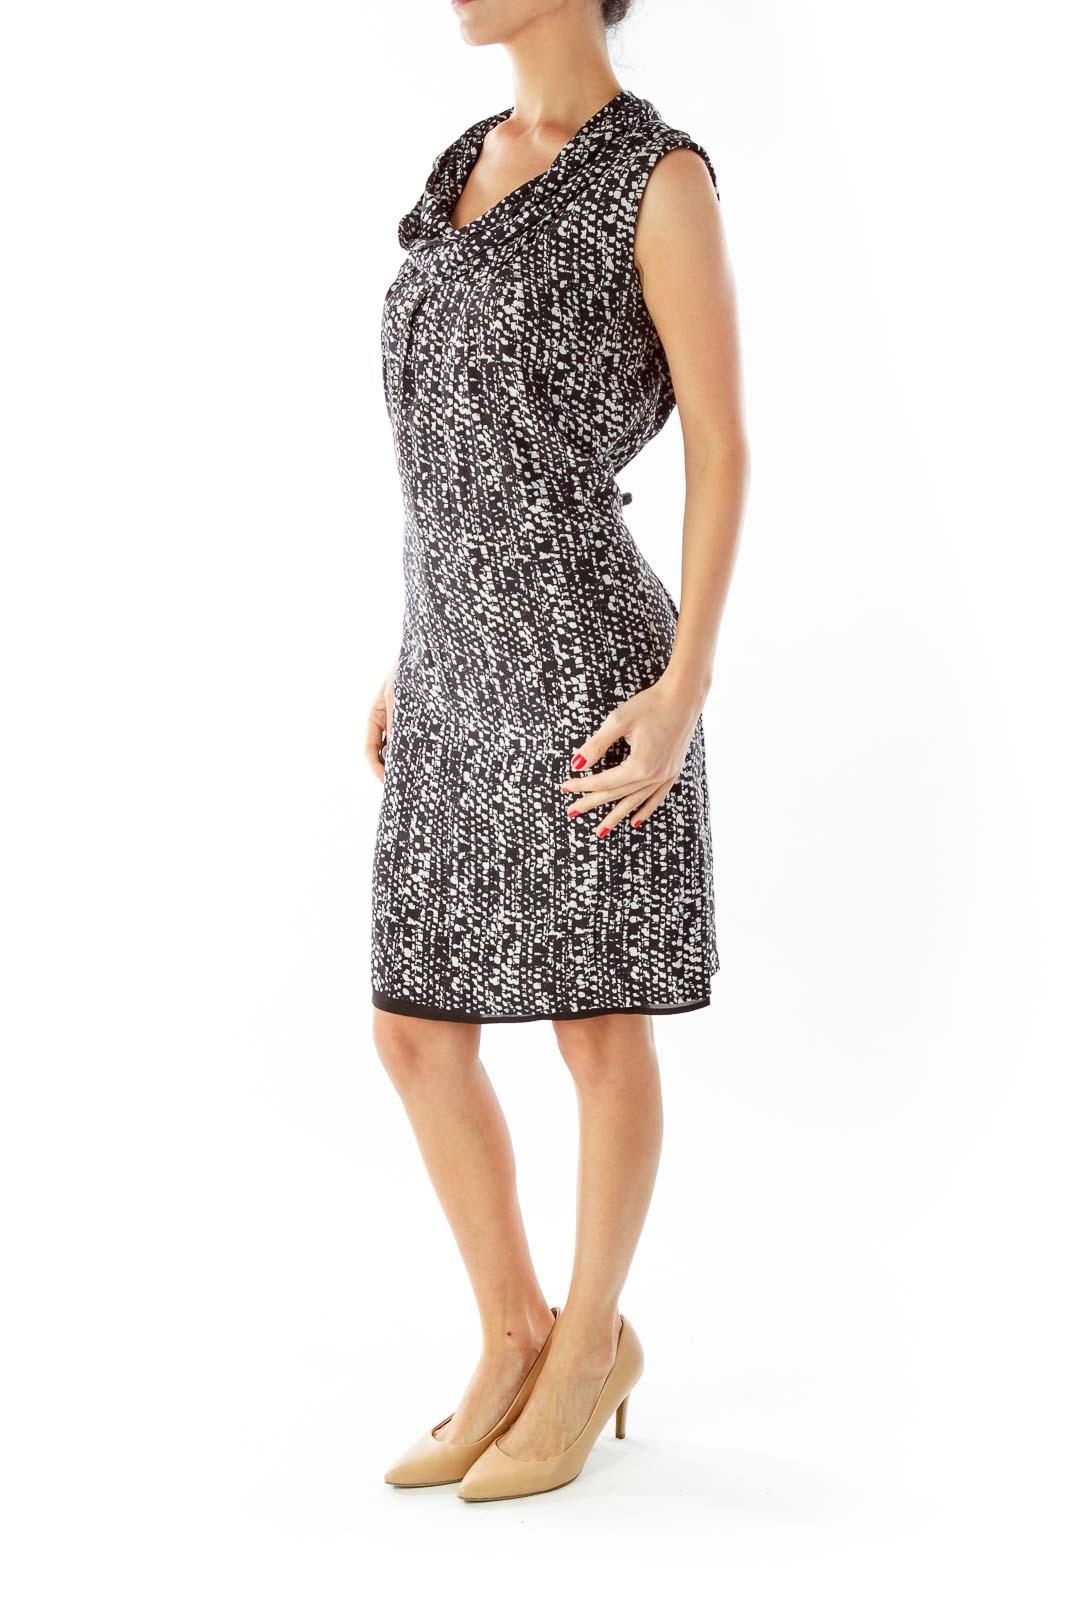 Black White Cowl Neck Day Dress